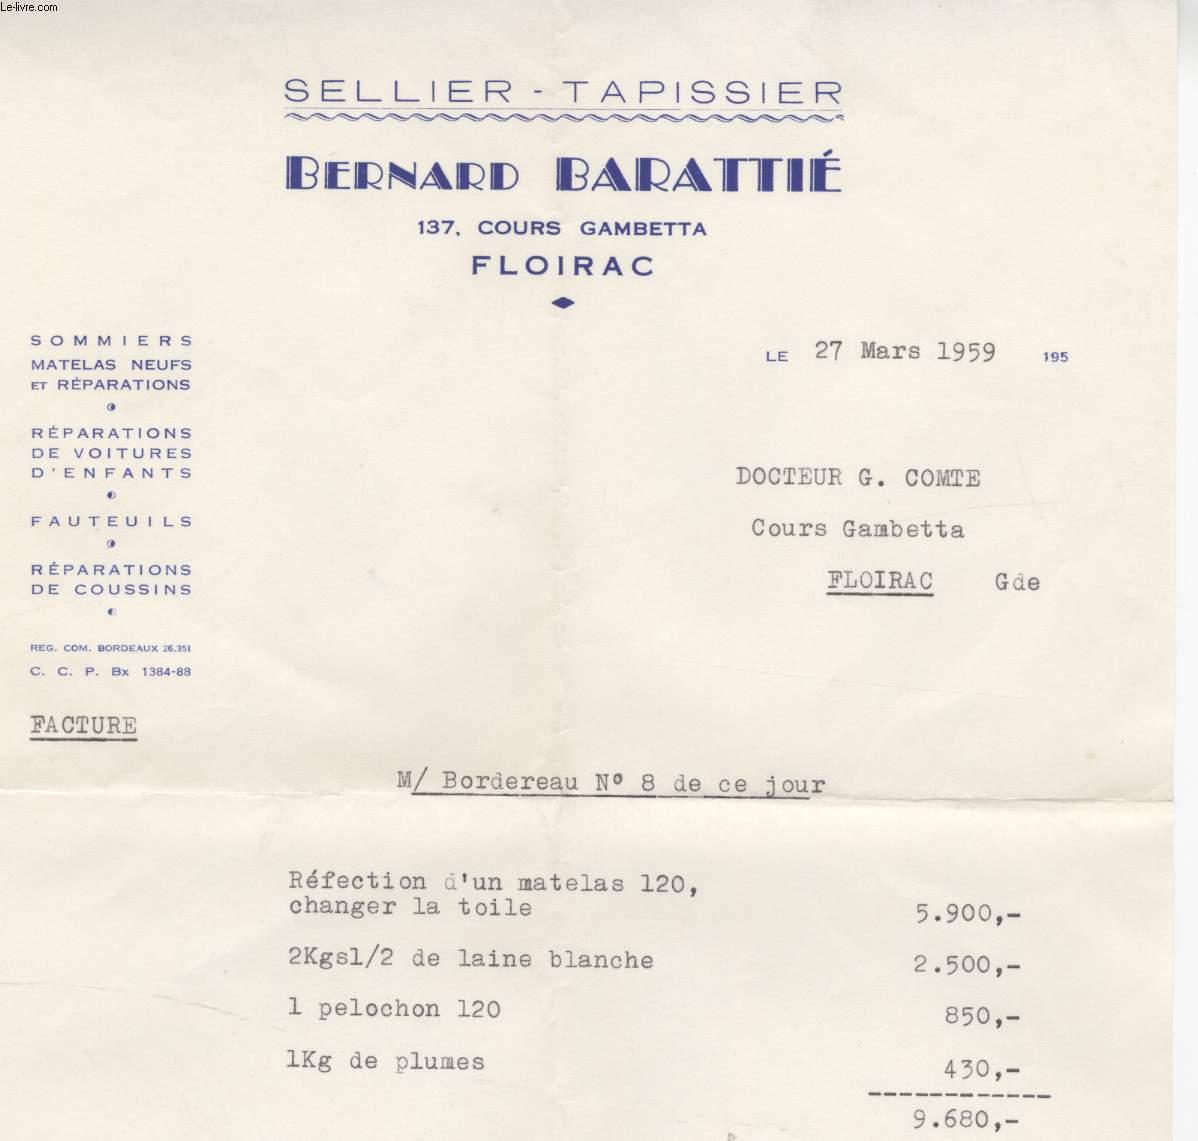 FACTURE ANCIENNE - SELLIER - TAPISSIER - BERNARD BARATHE